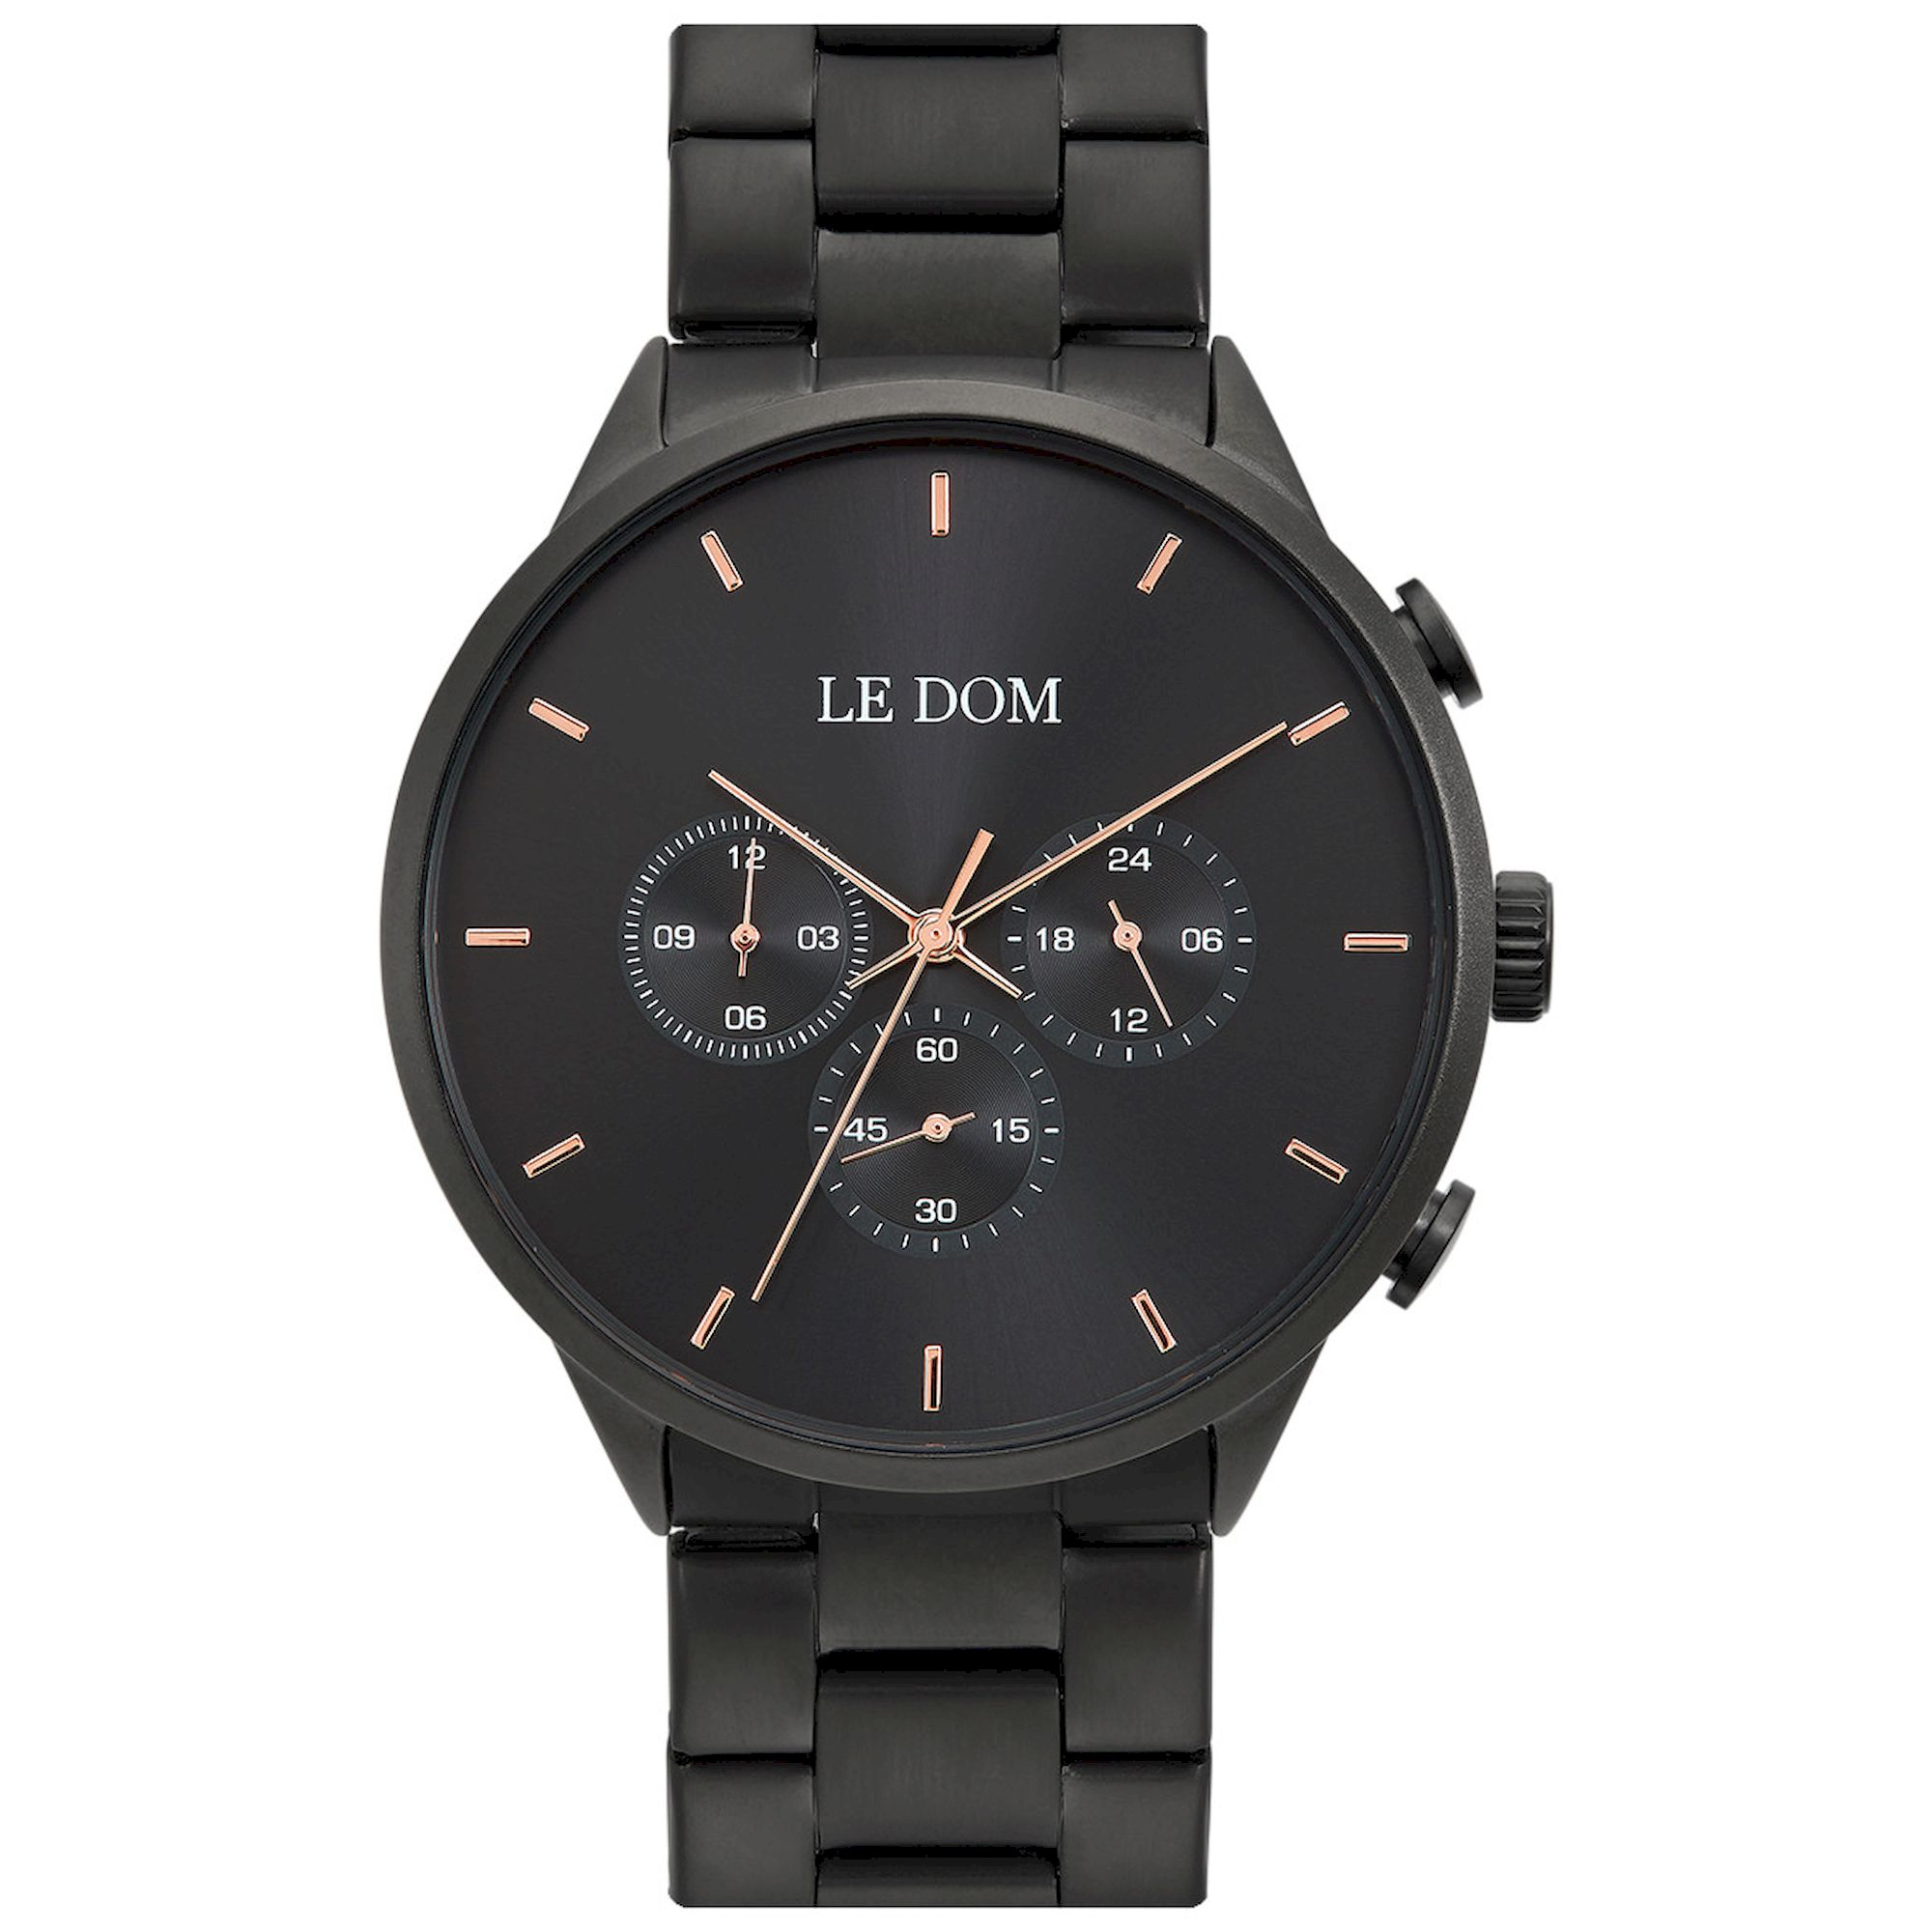 LE DOM Principal Μαύρο Καντράν LD.1436-5, le dom, ανδρικό ρολόι, ρολόγια, Δωρεάν έξοδα αποστολής, Άμεση ΔΙαθεσιμότητα, Le Dom Ρολόγια